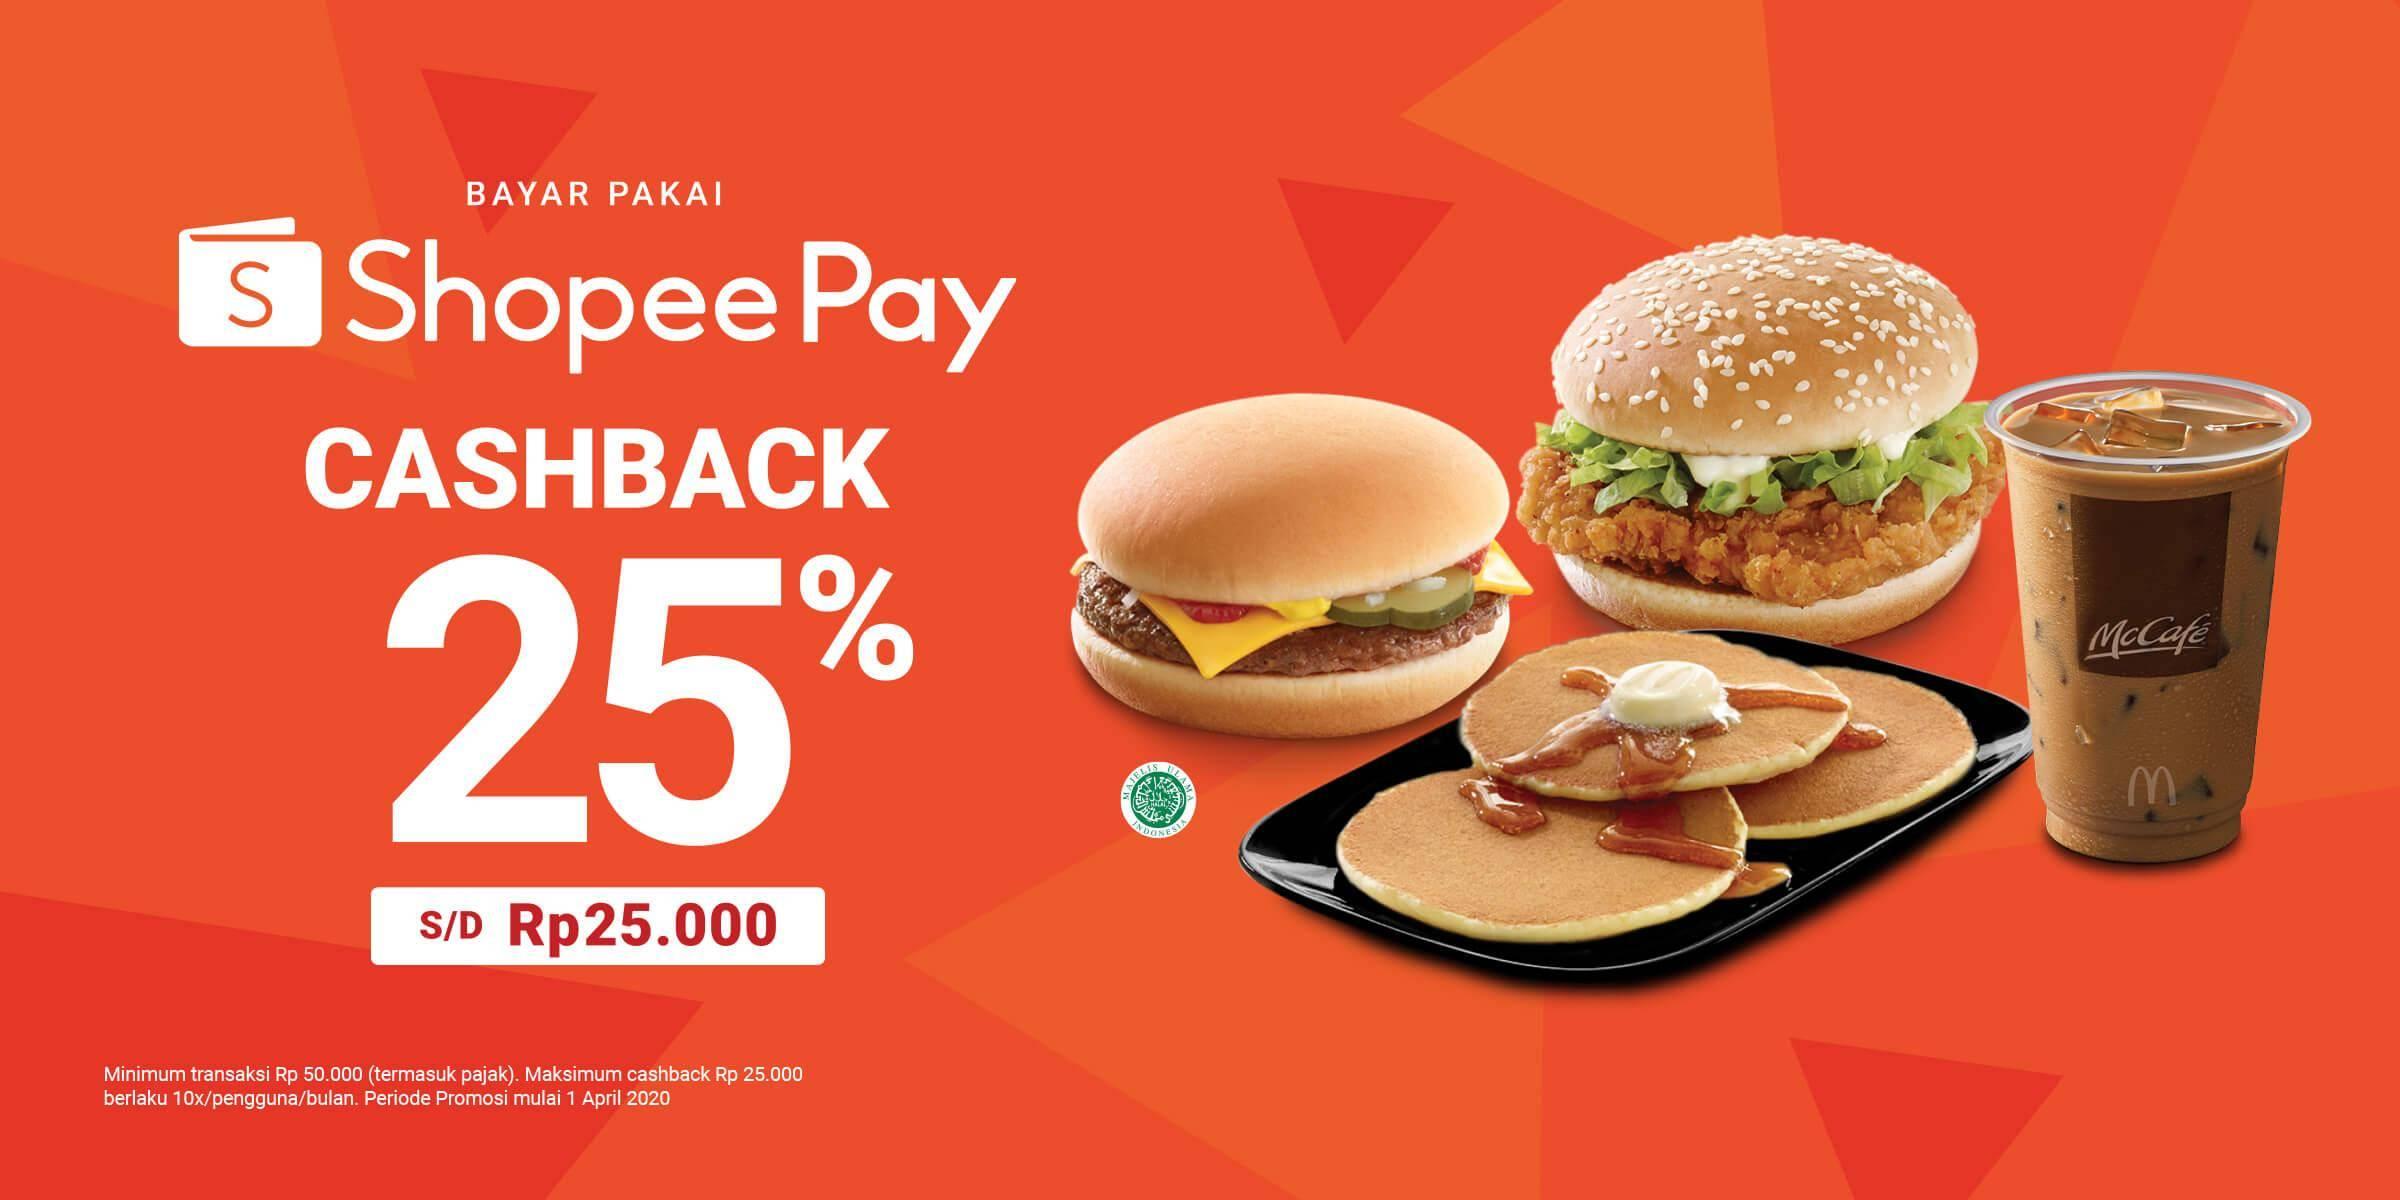 Diskon McDonalds Promo Cashback 25% Dengan Transaksi Menggunakan Shopee Pay